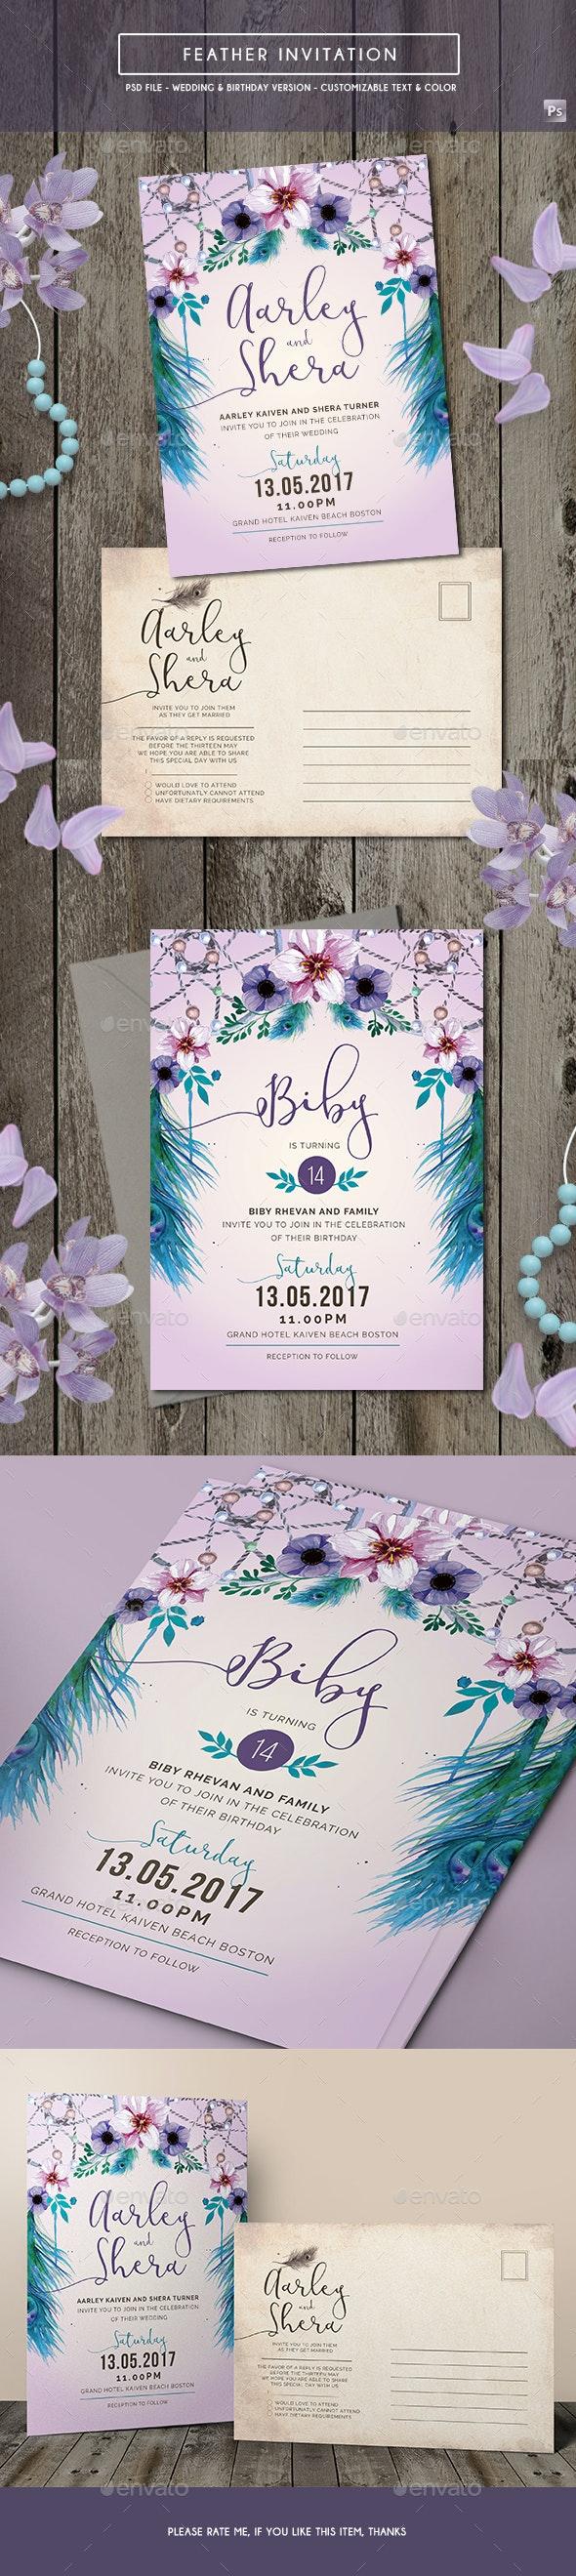 Feather Invitation (Wedding & Birthday) - Invitations Cards & Invites